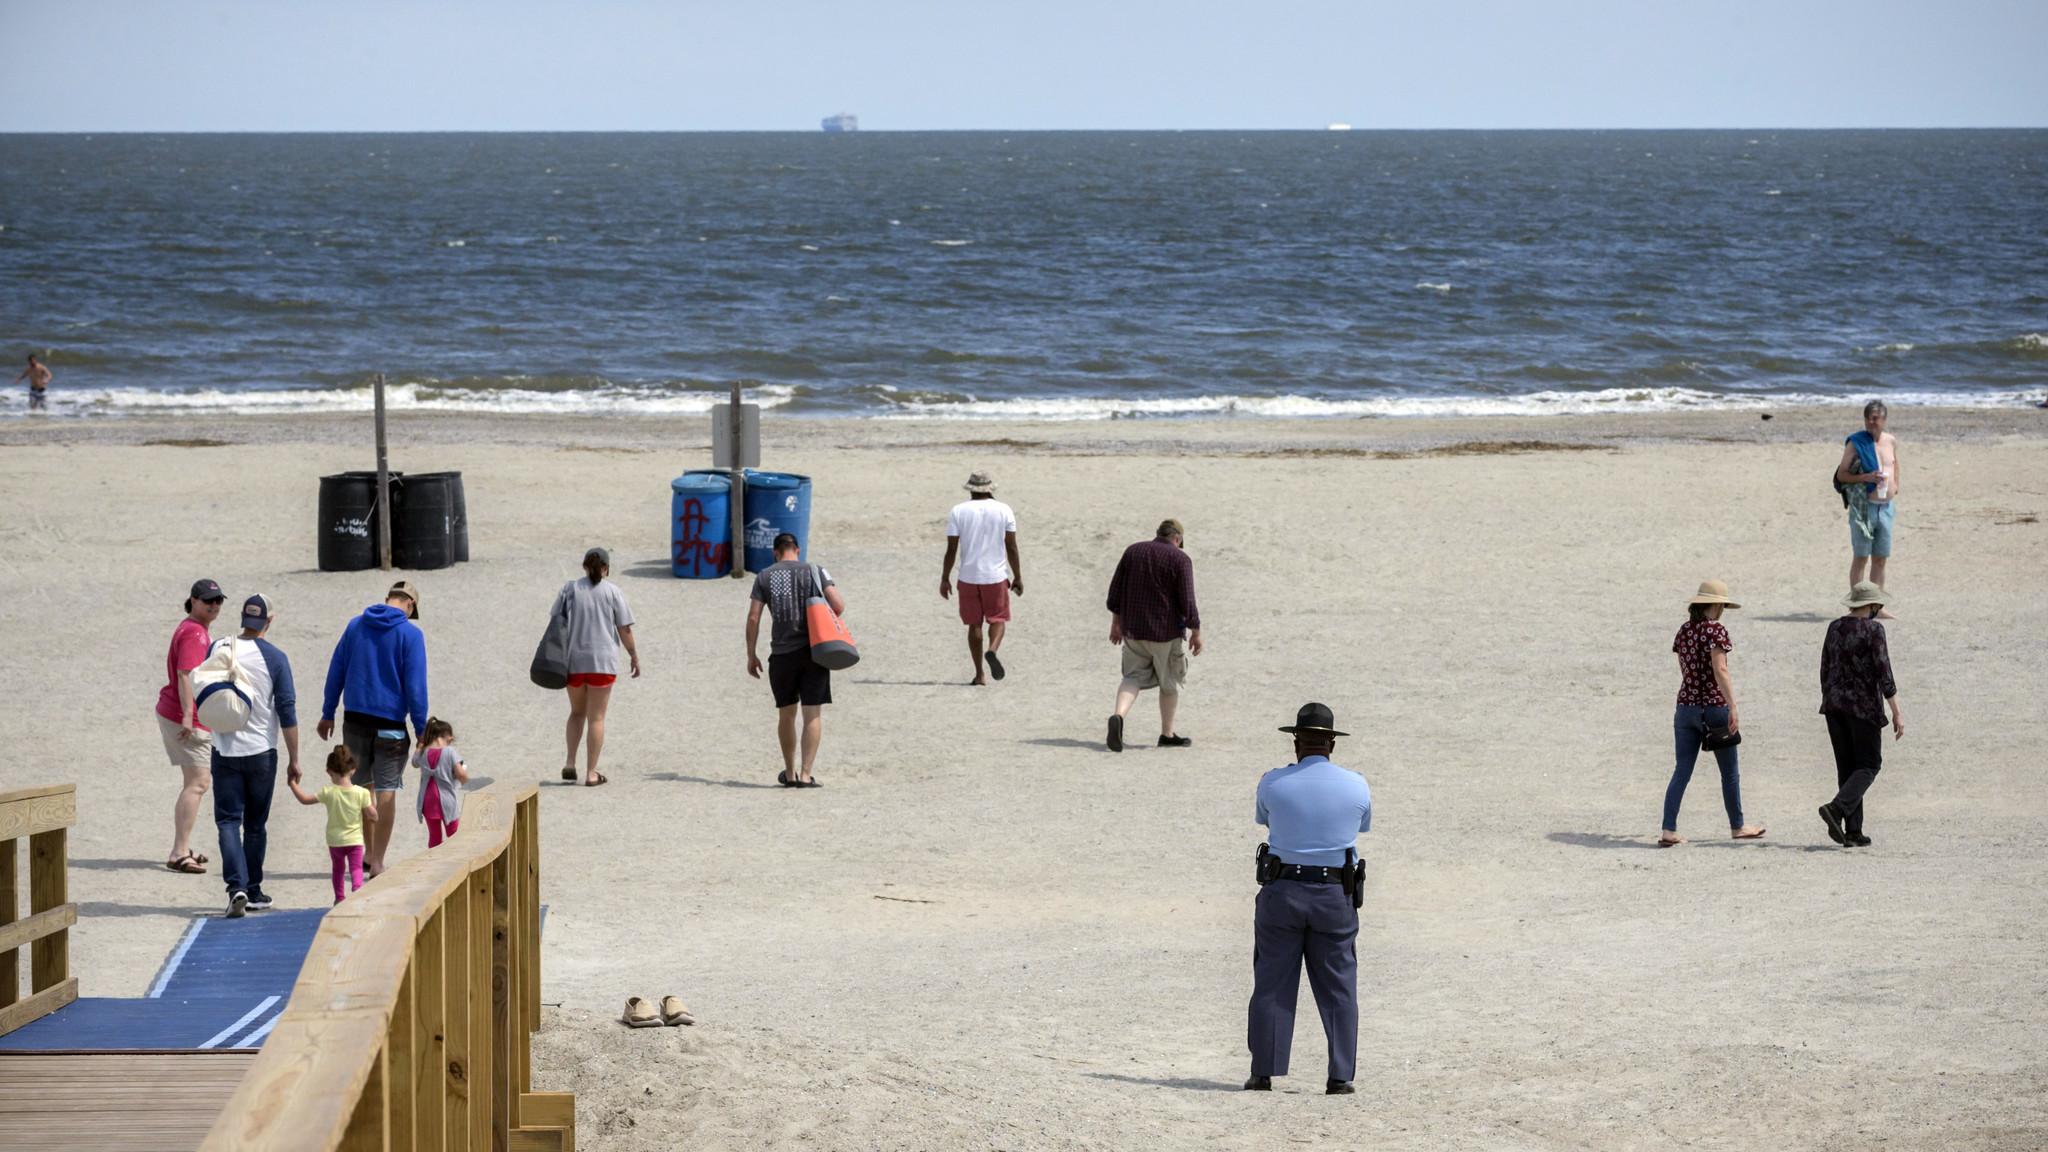 Georgia governor re-opens beaches despite coronavirus lockdown, but Tybee Beach mayor opposes decision